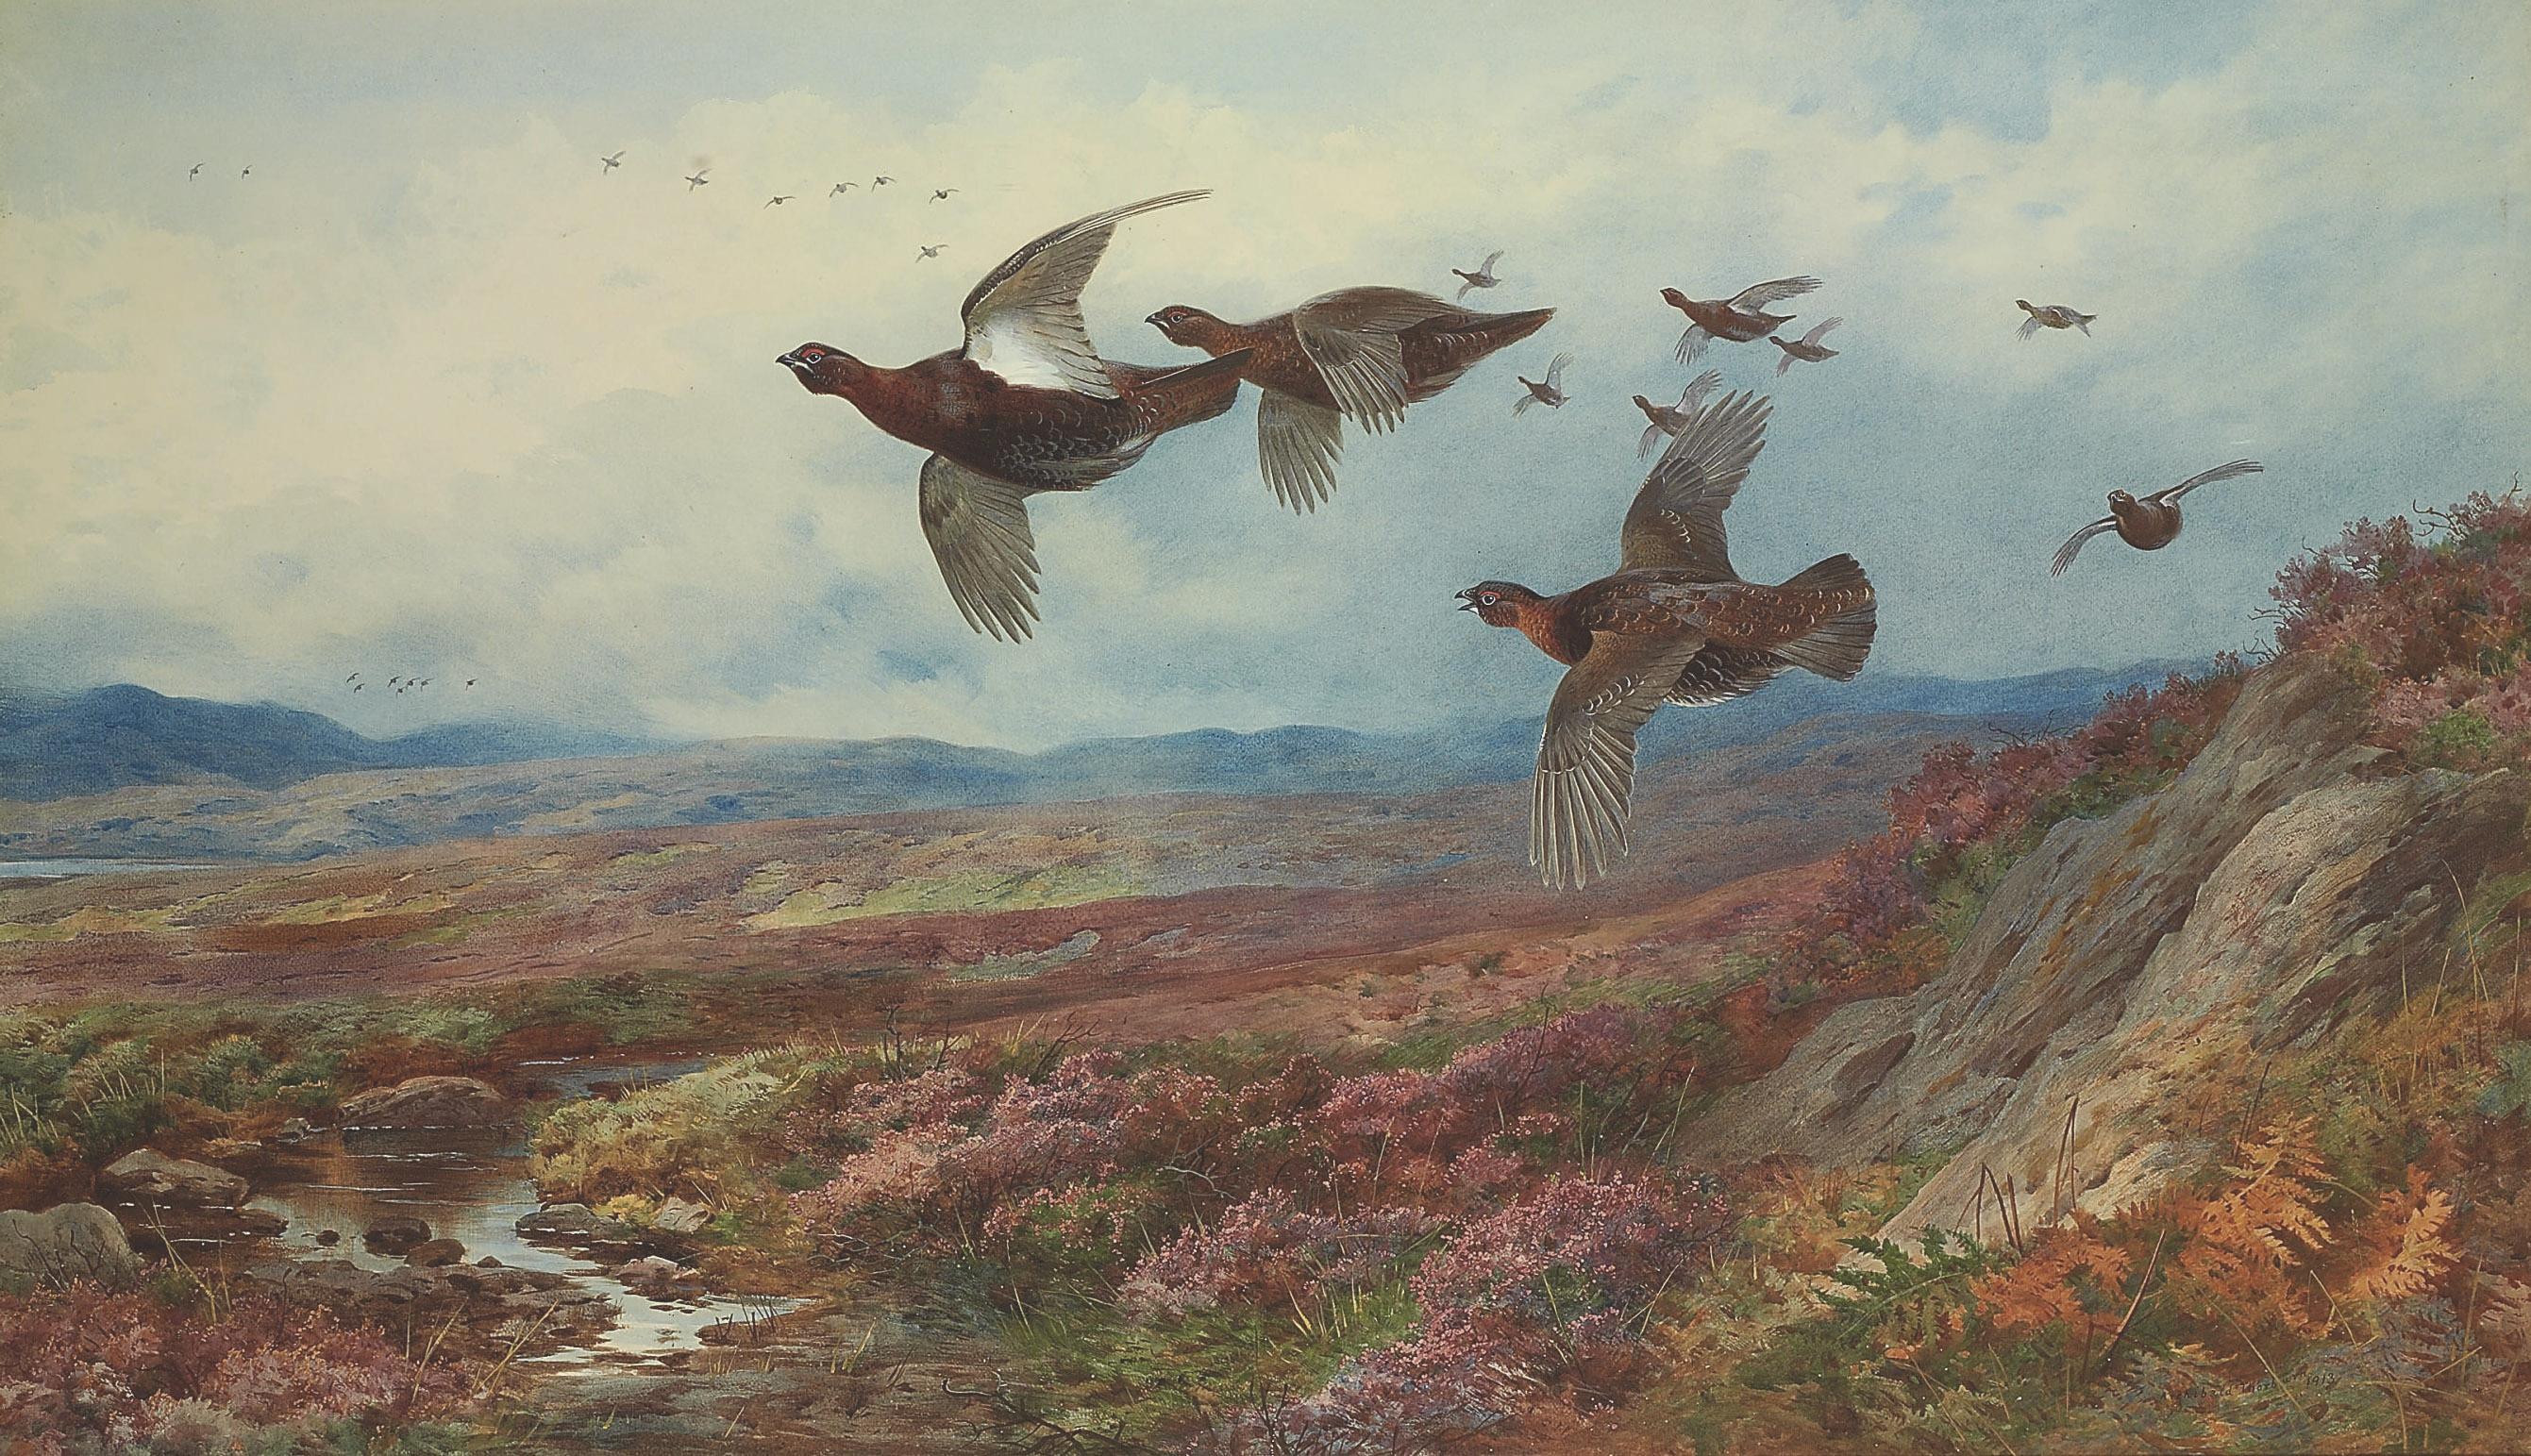 Grouse in flight